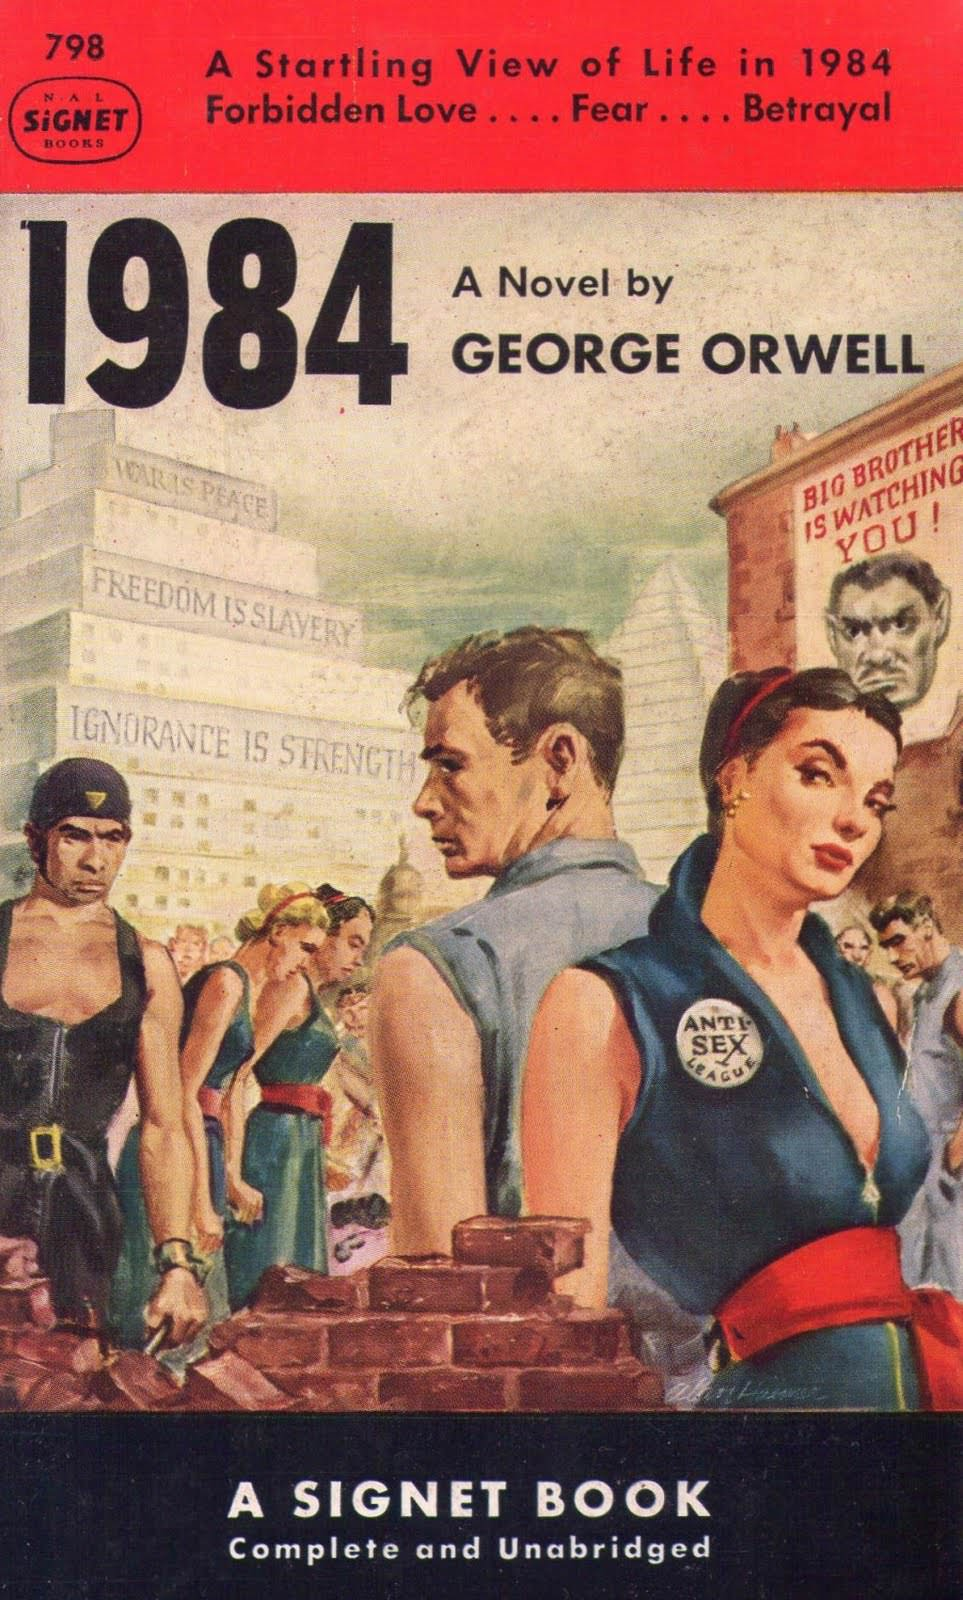 1984 by George Orwell?